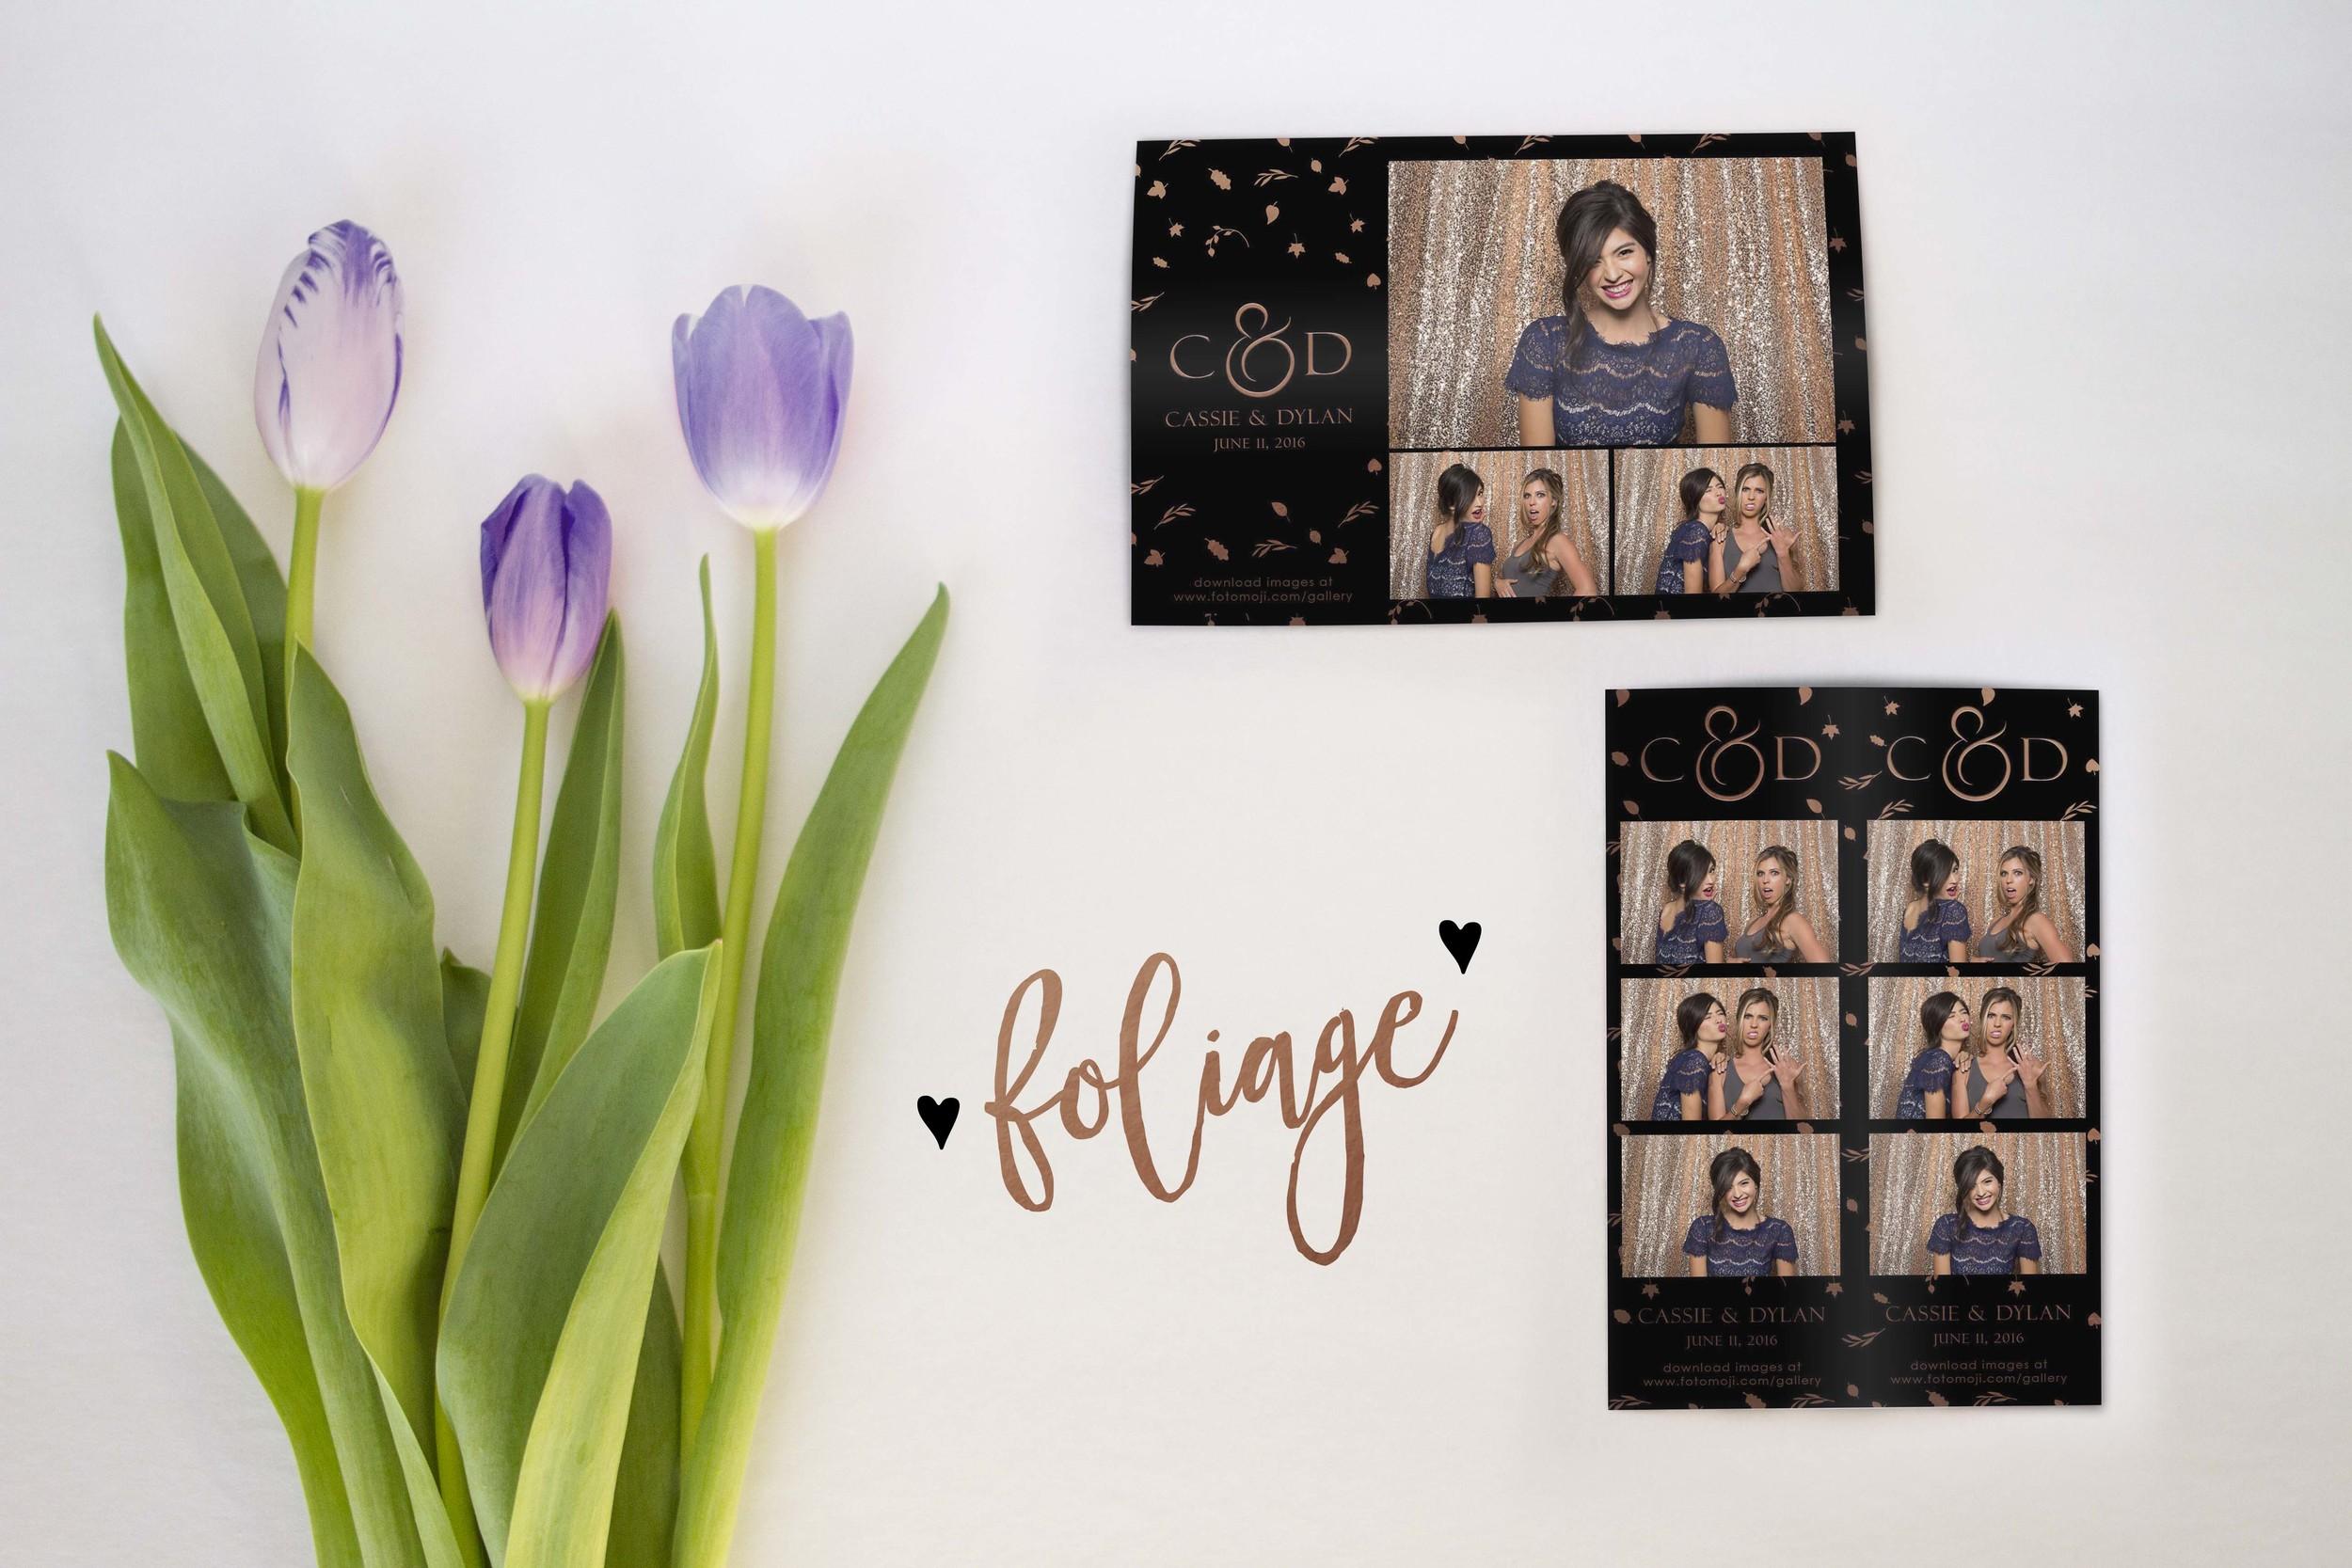 Foliage_Tulips_Calgary_Photobooth_templates.jpg